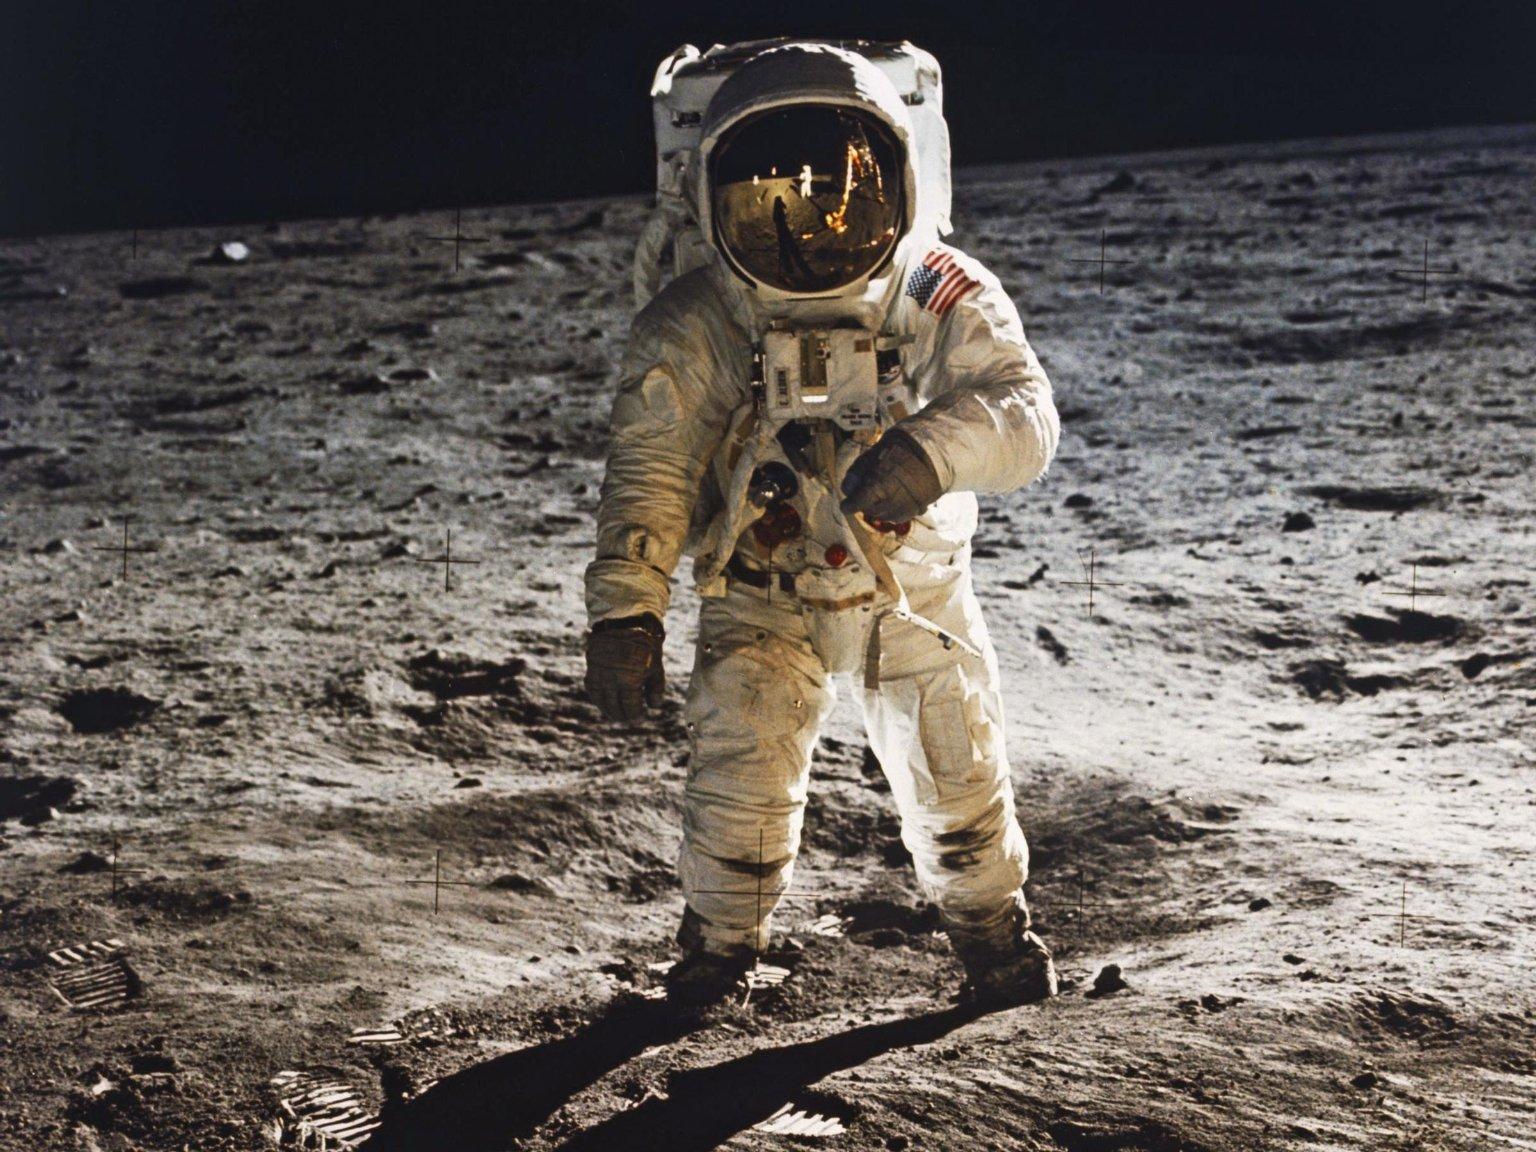 'One Giant Leap': As Apollo 11 Moon Landing Turns 45, NASA Aims for Mars